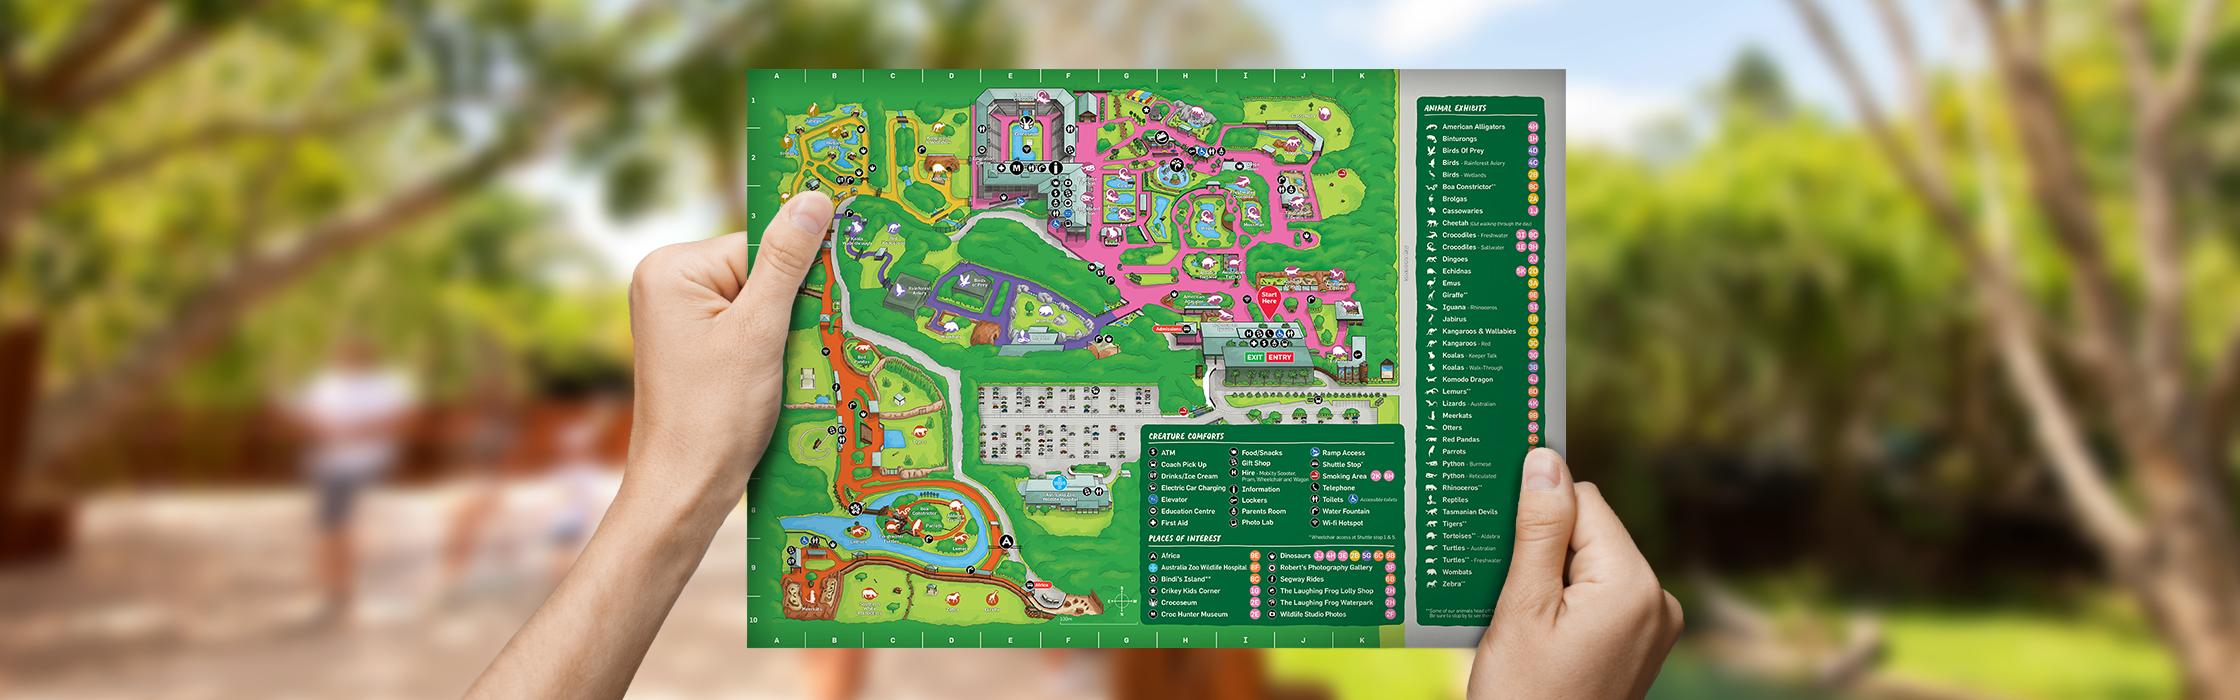 Australia Zoo Map Hands